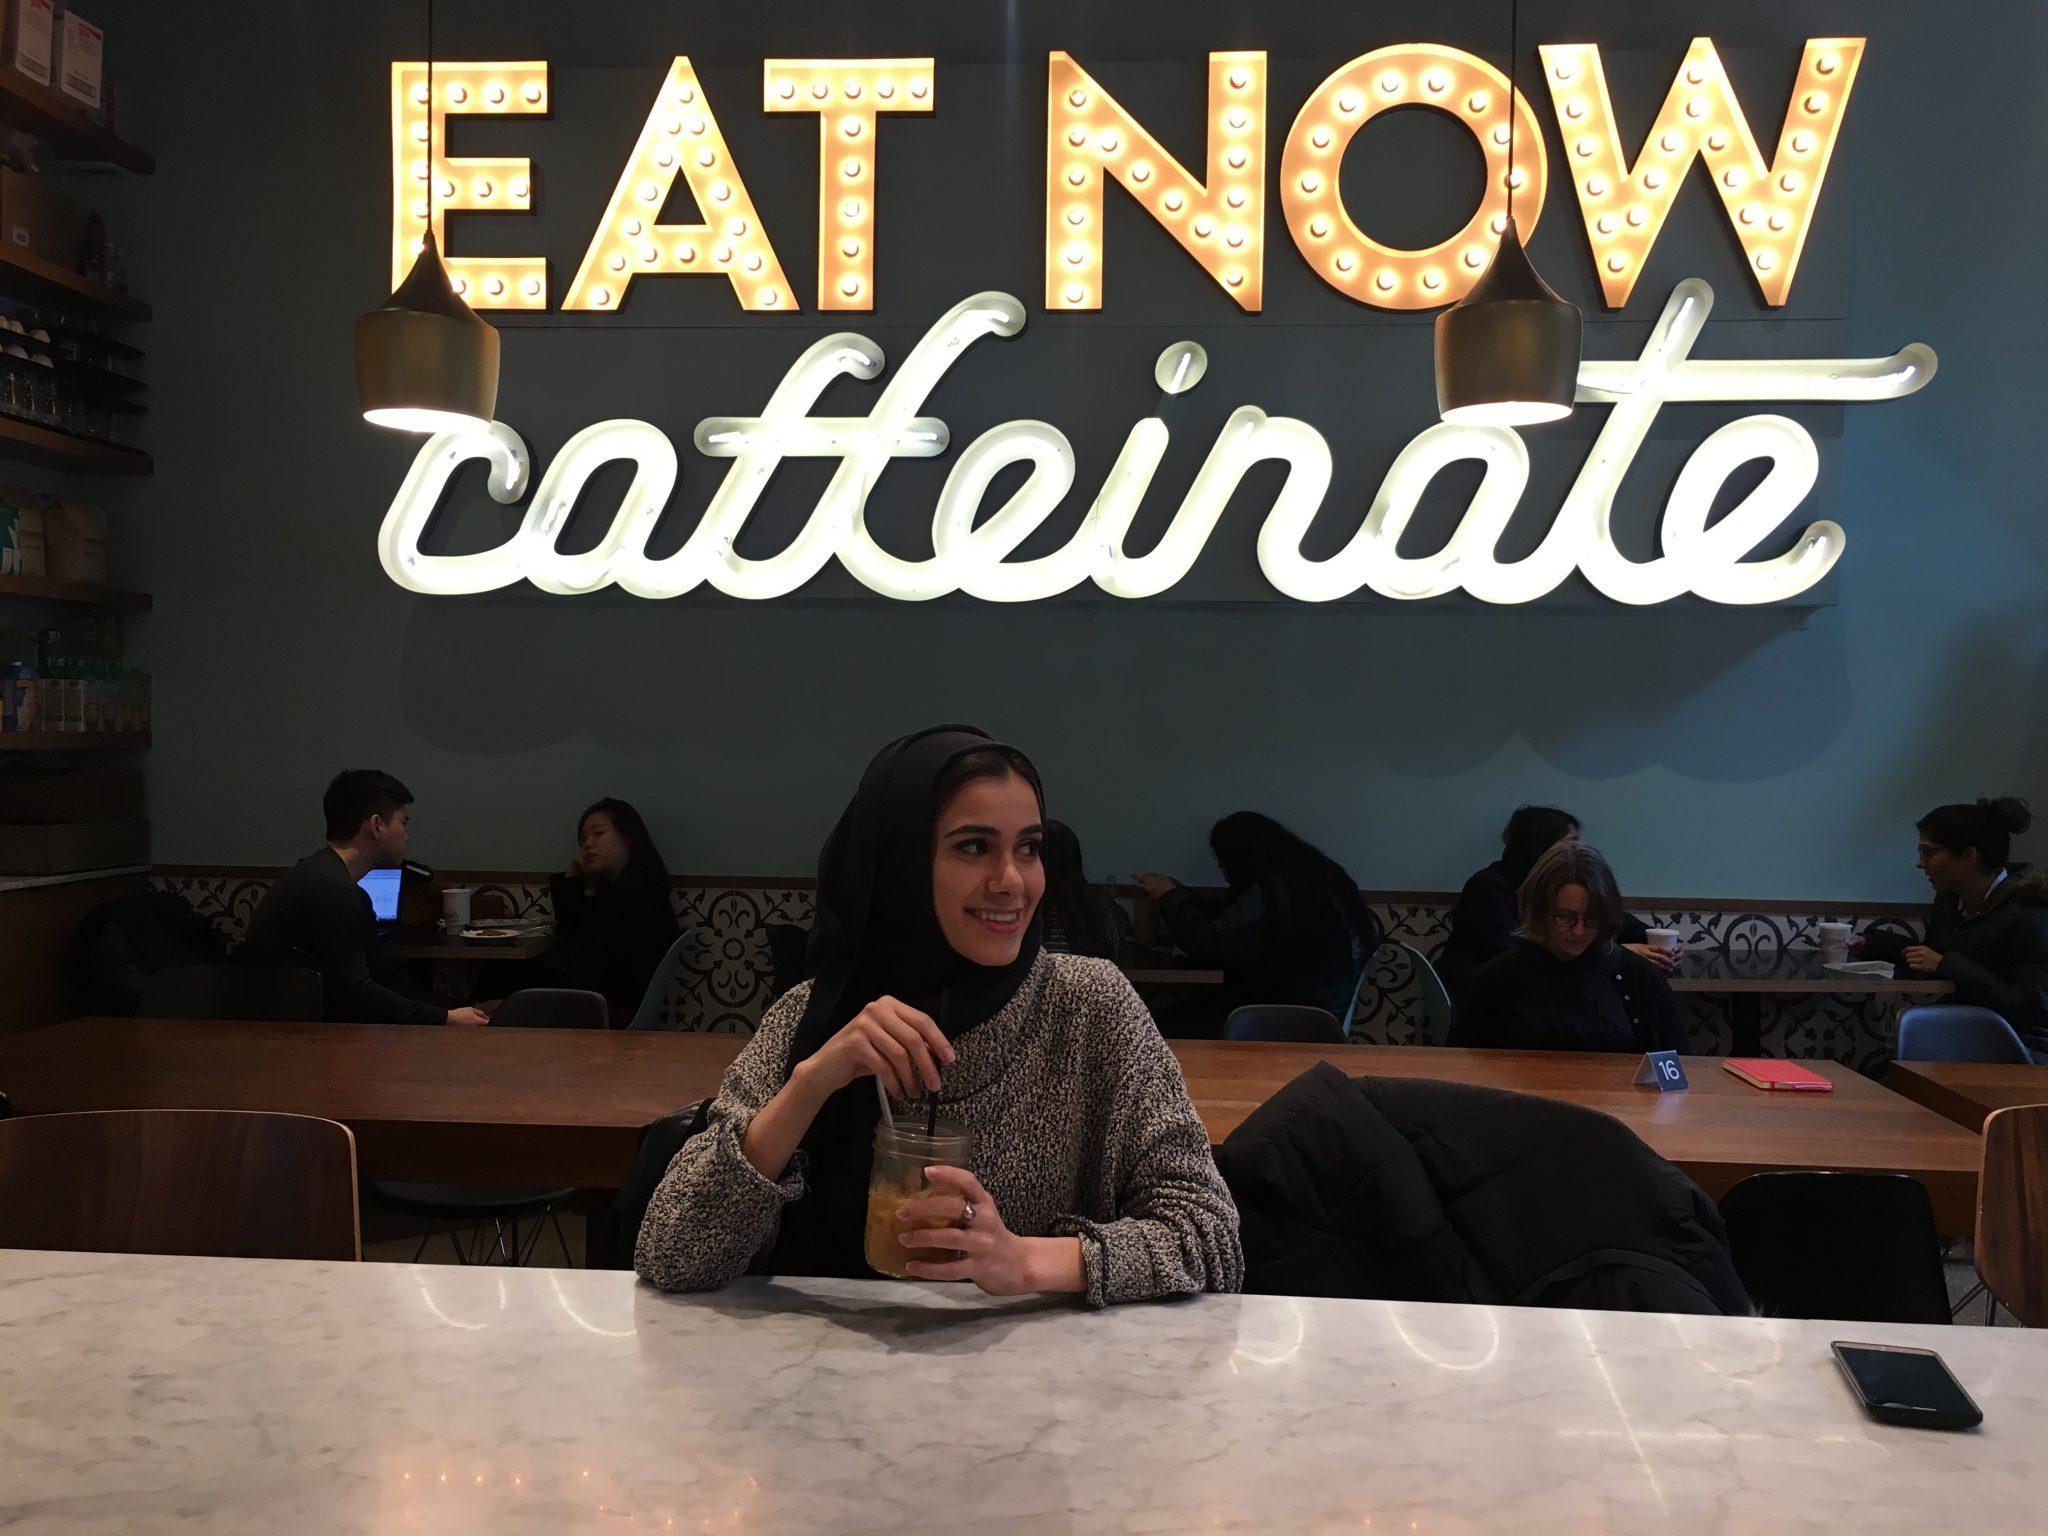 Coffee Talk, Cool Tones and Rainbow Cake -